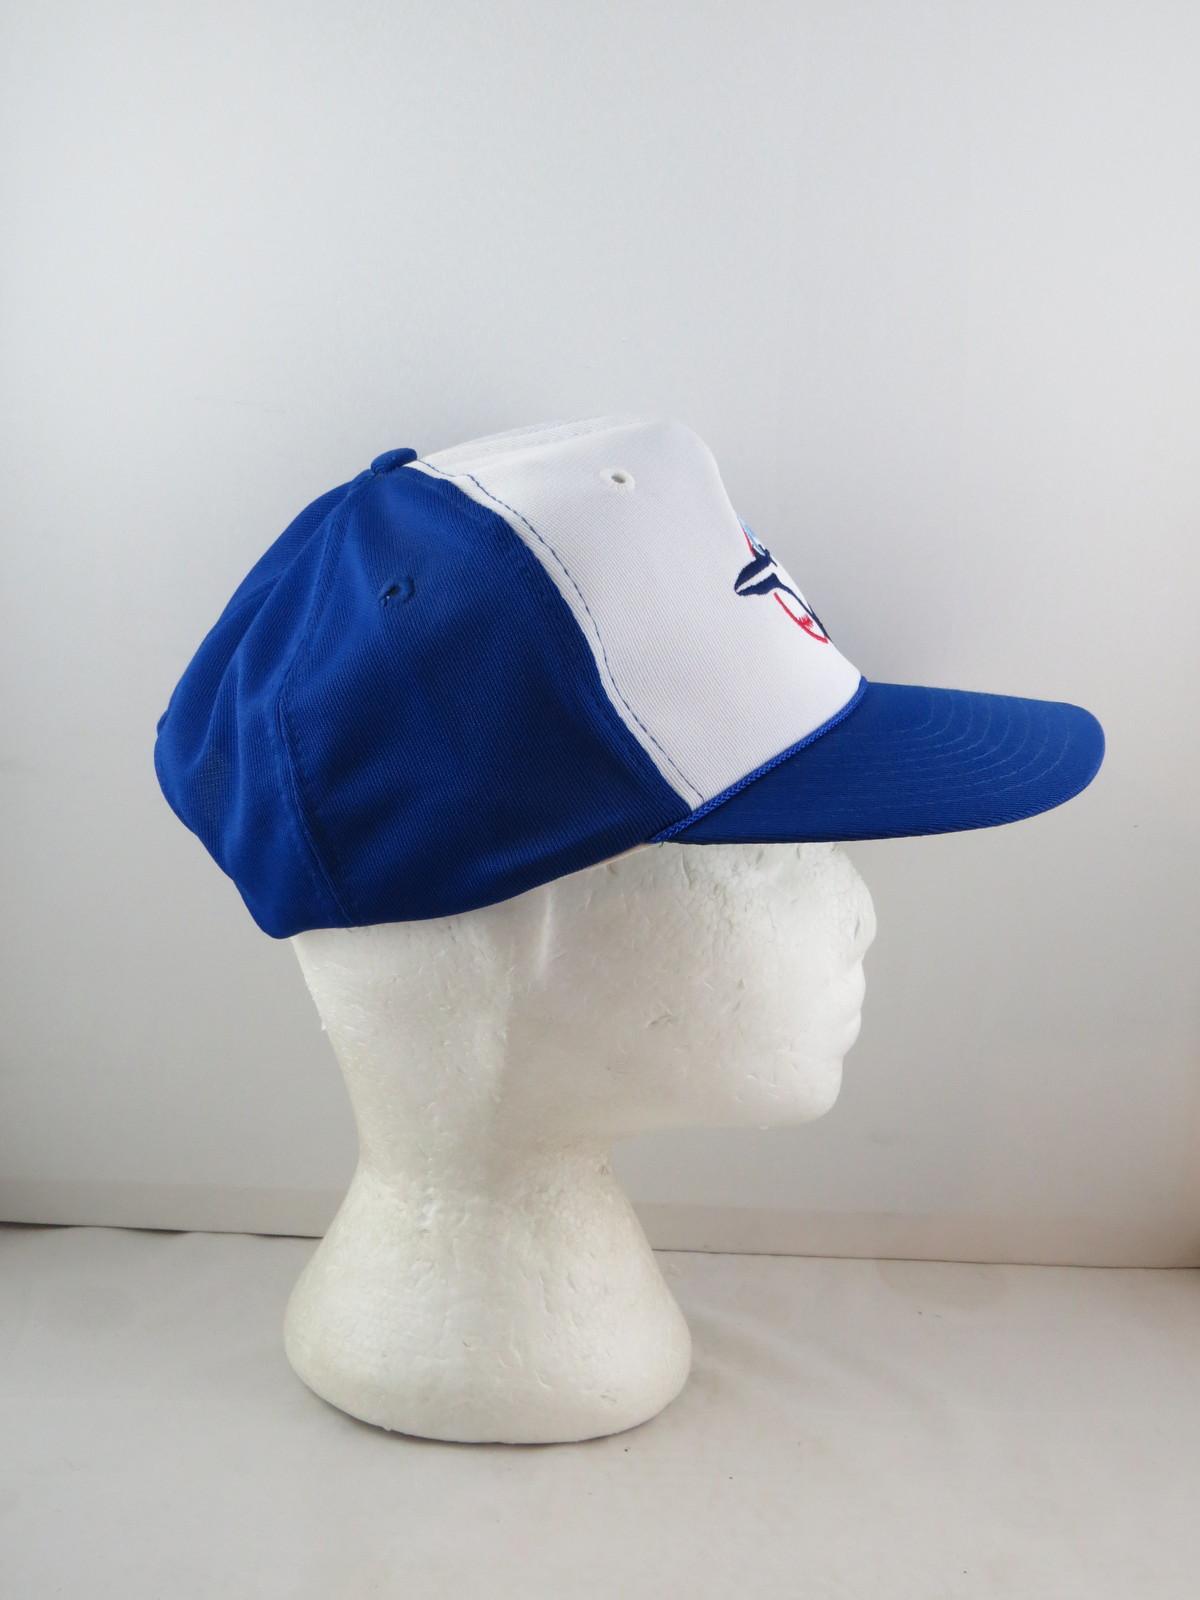 Toronto Blue Jays Hat (VTG) - Polyester Classic by Twins - Adult Snapback